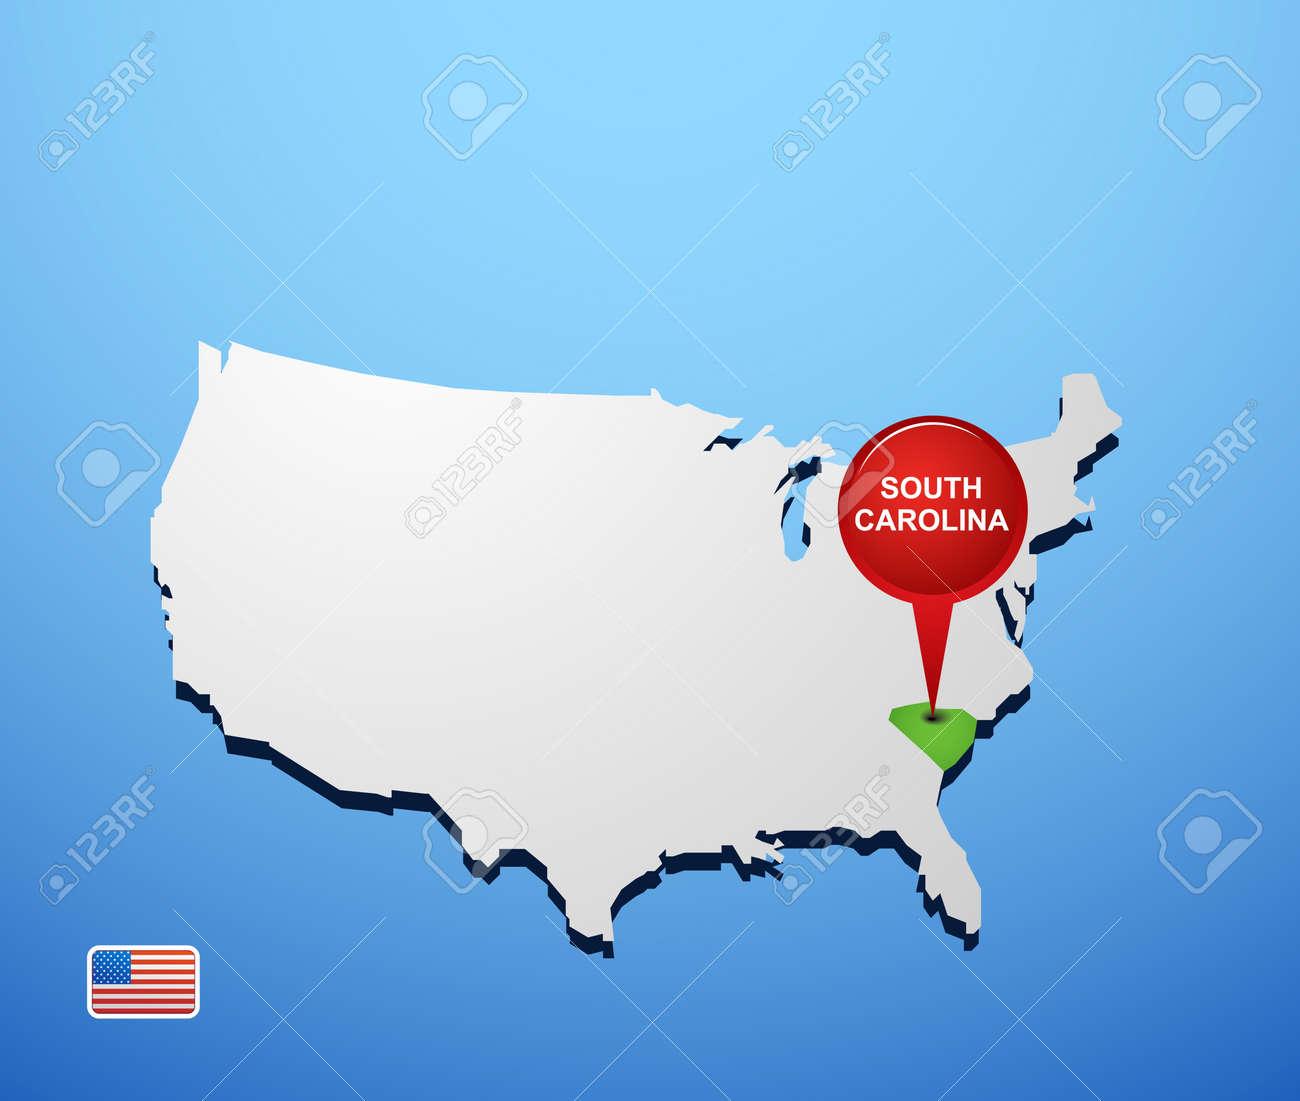 South Carolina Map Map Of South Carolina Detailed SC Map - Map of usa showing south carolina